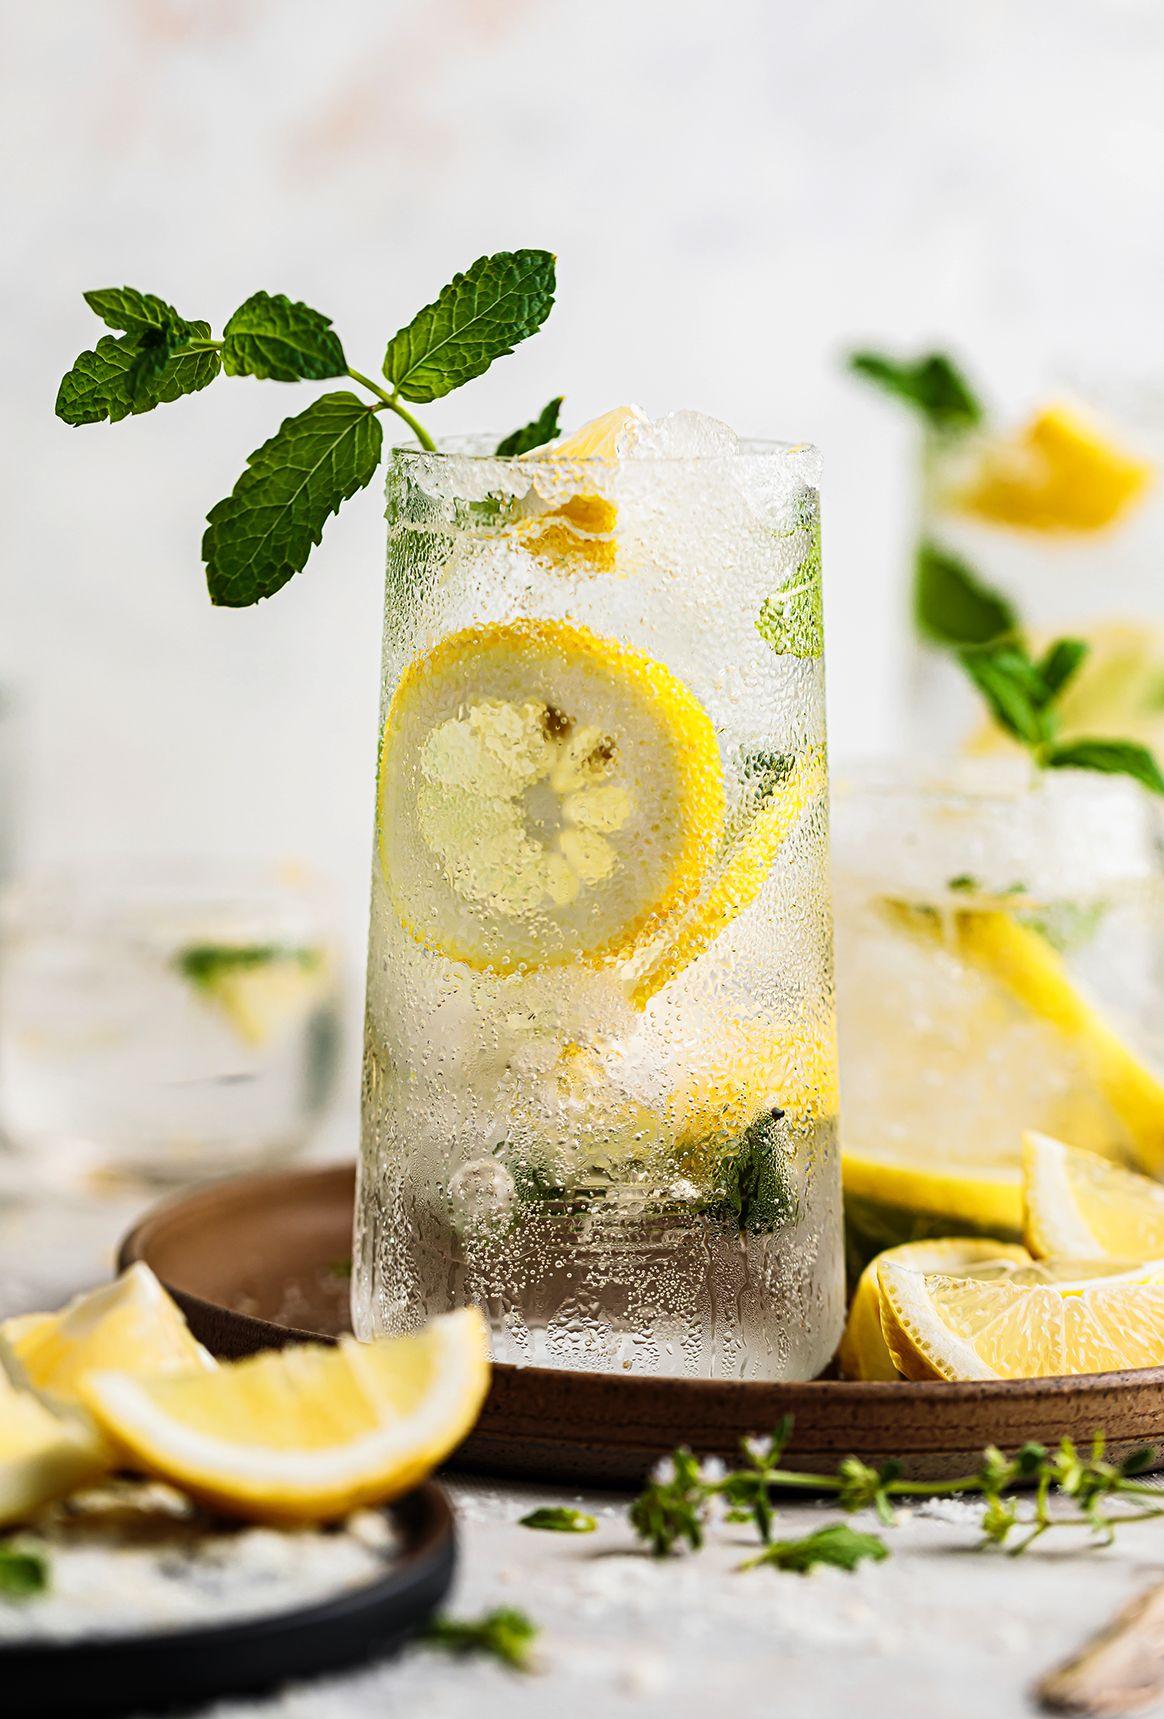 Refreshing Lemon Mojito Recipe Mojito Delicious Drink Recipes Yummy Drinks